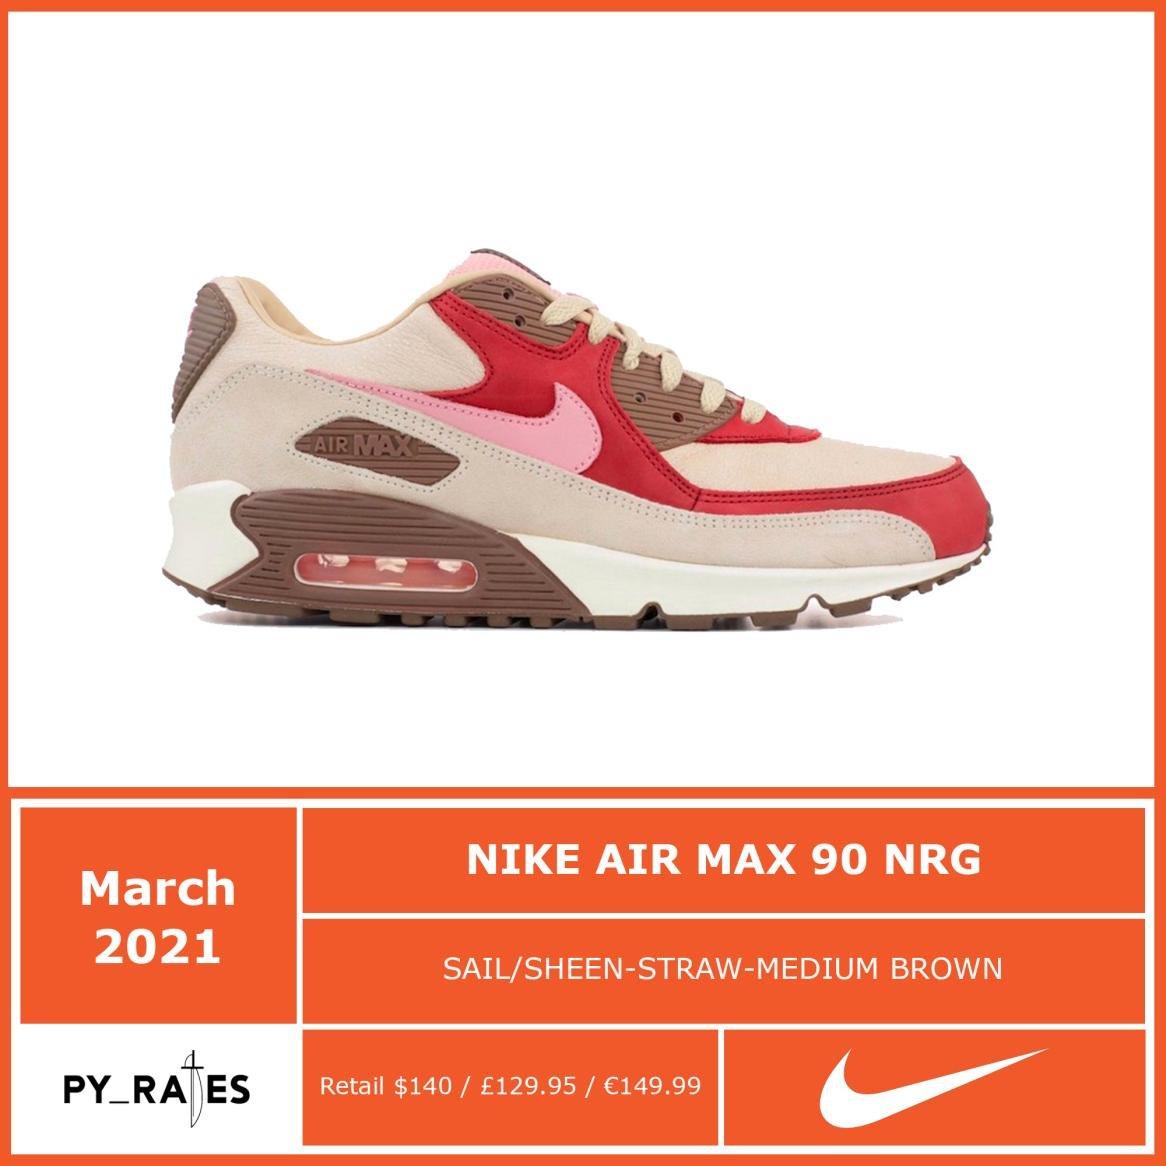 DQM Nike Air Max 90 Bacon CU1816-100 2021 Release Details